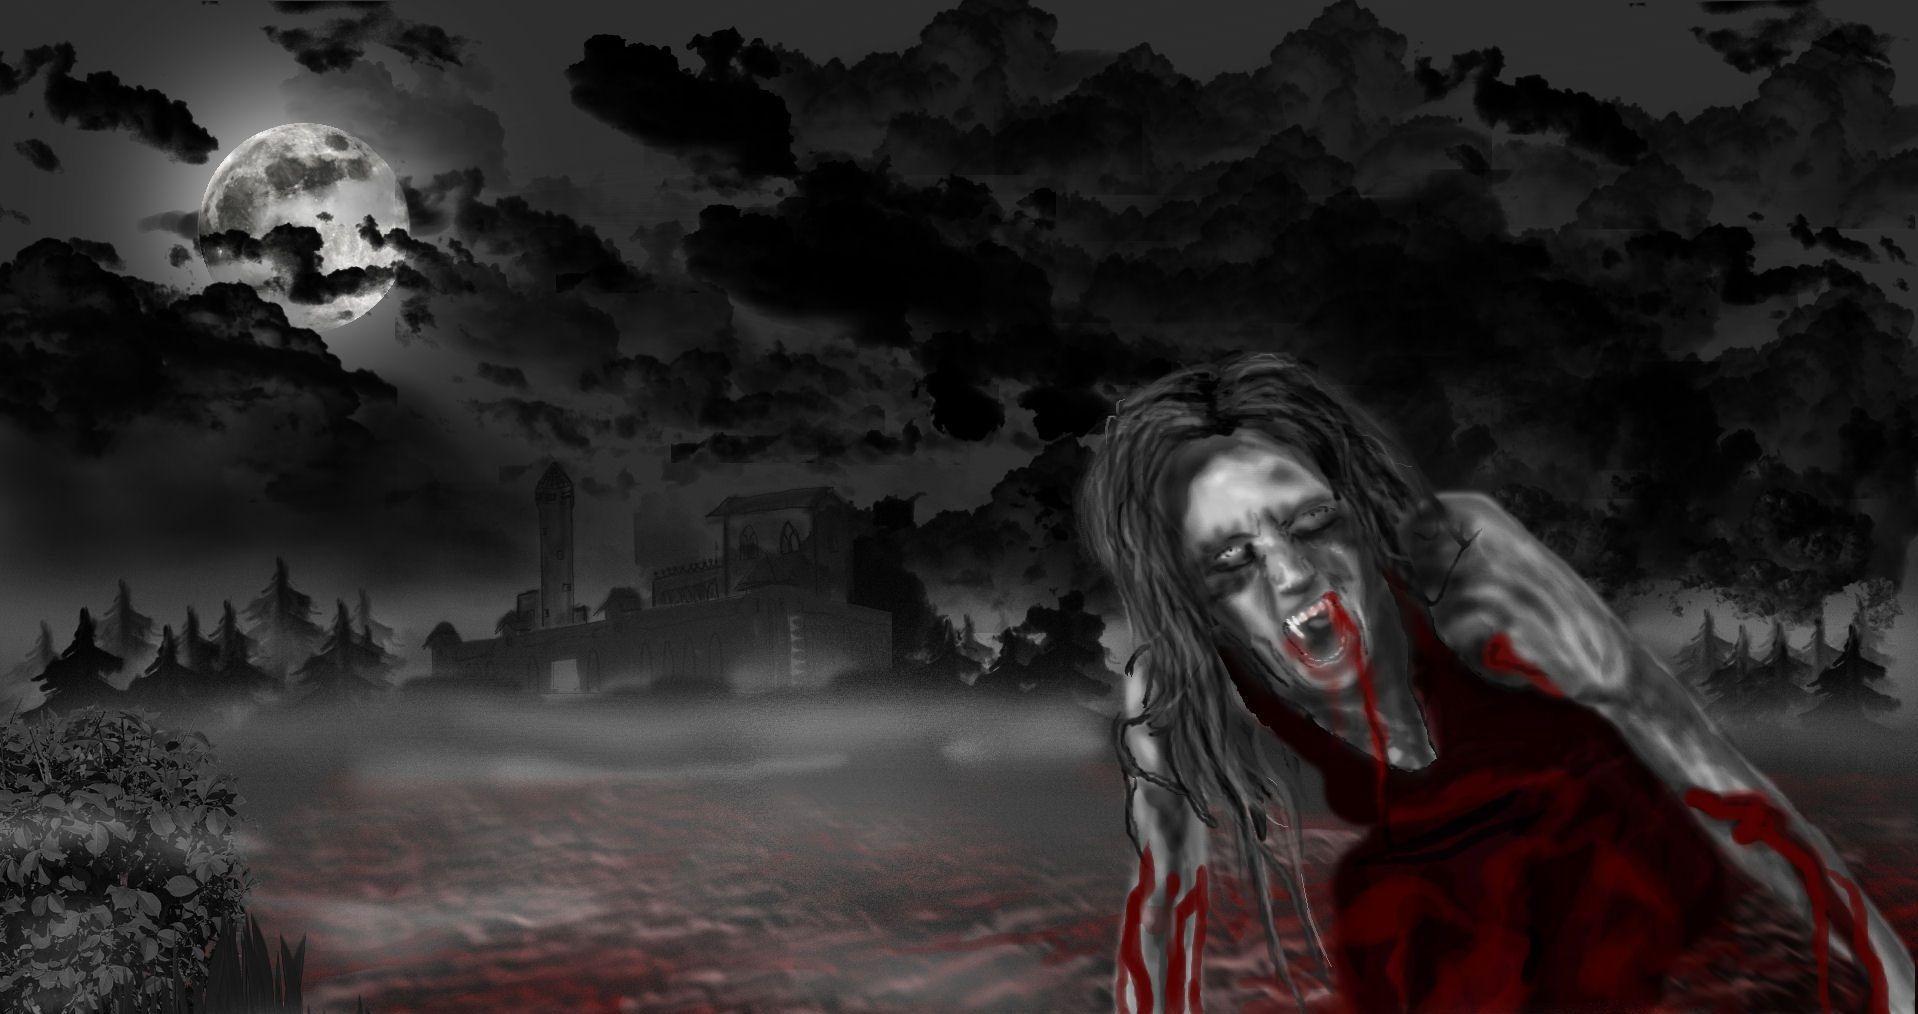 Vampires Wallpapers - Wallpaper Cave